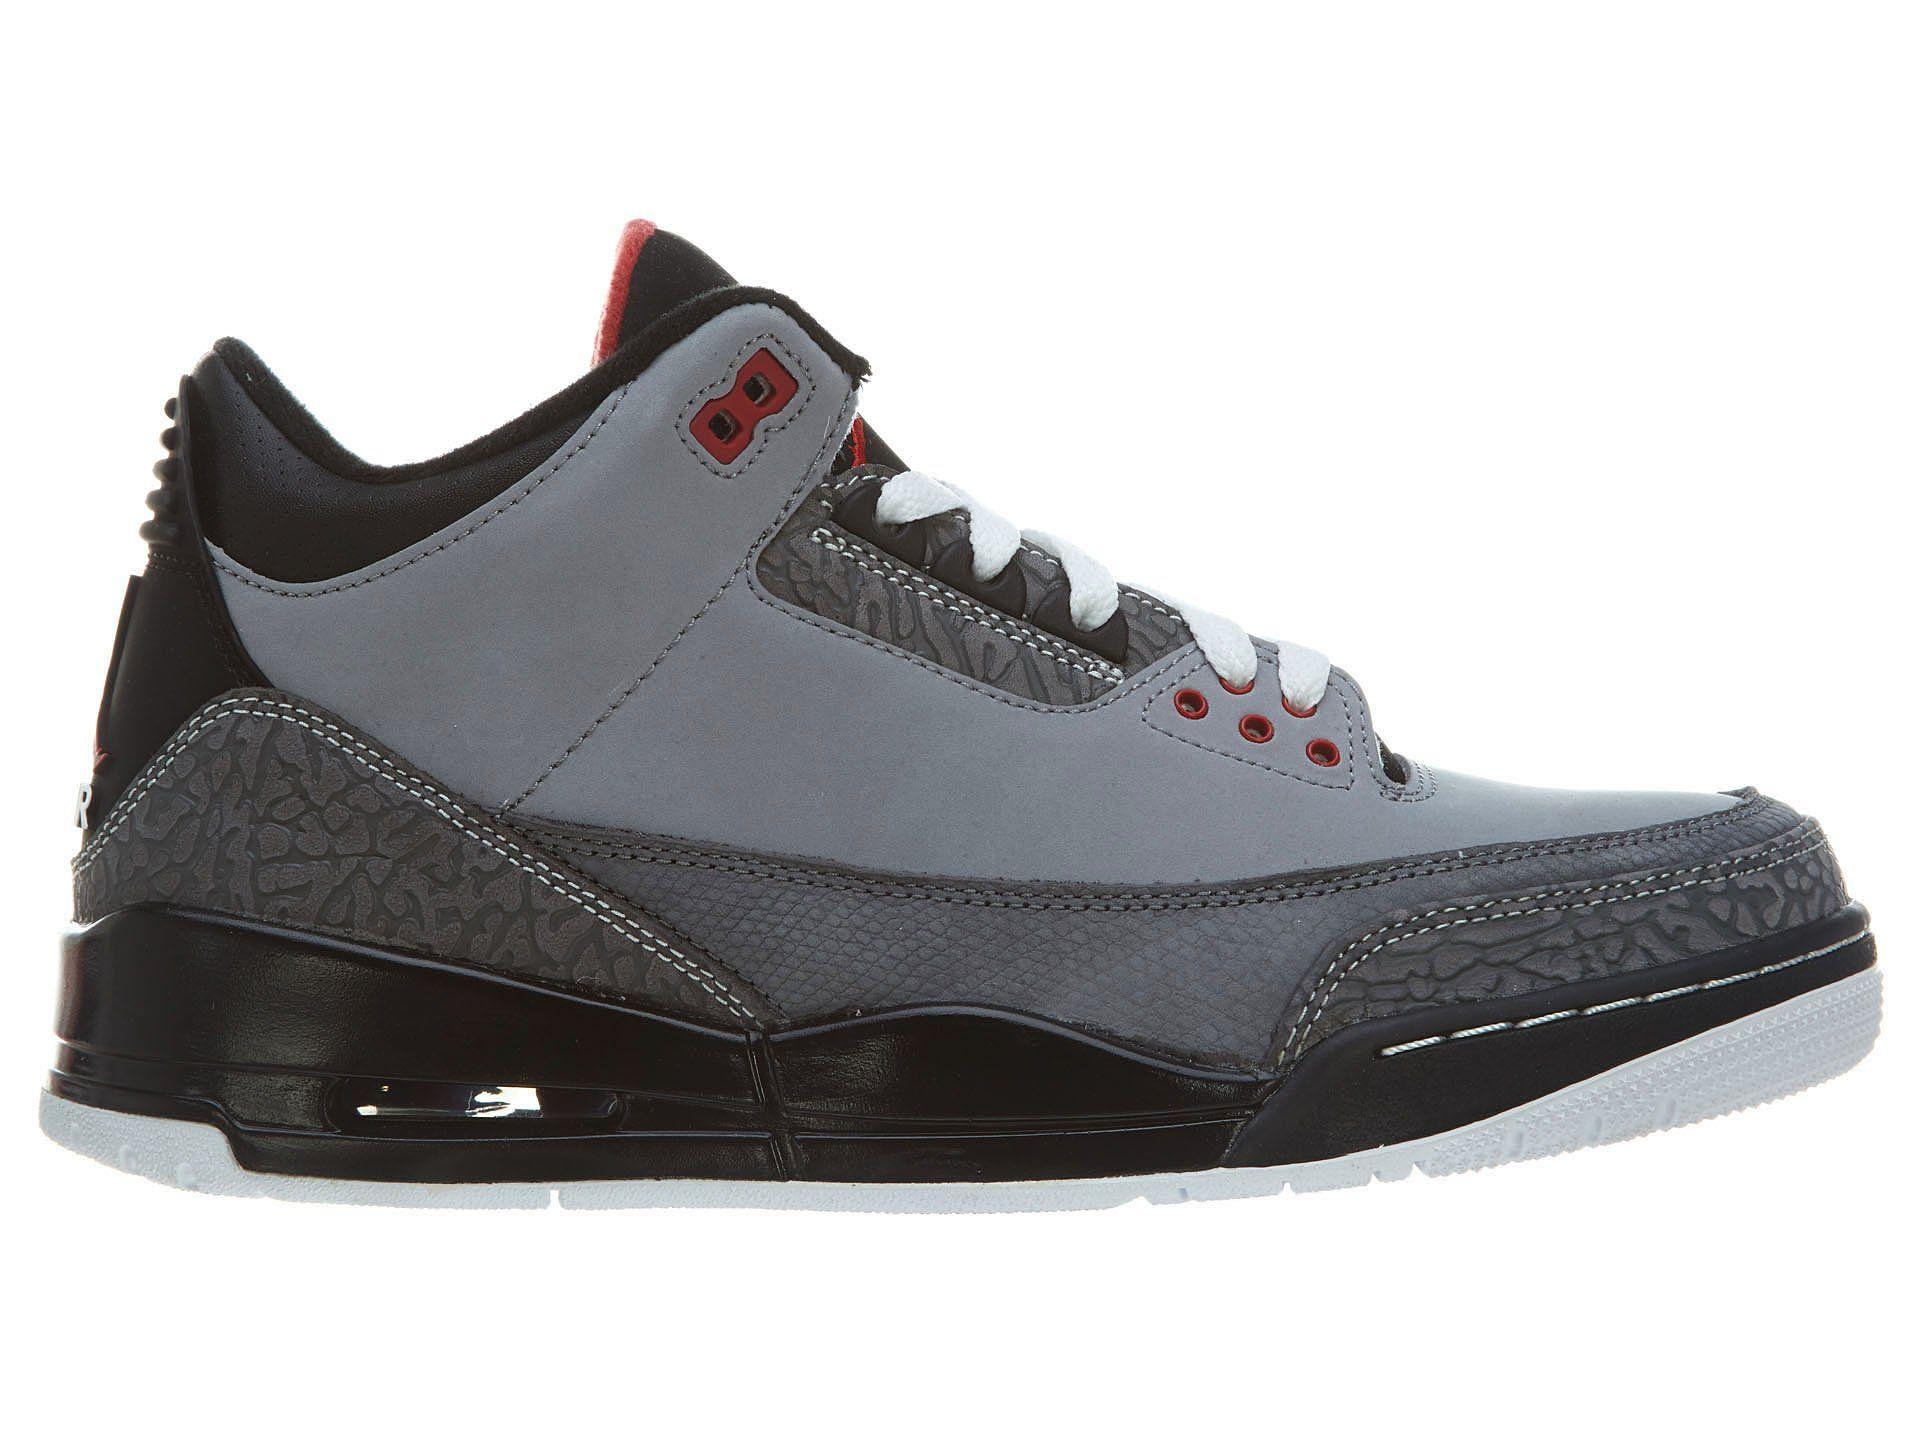 8984bcf1e601 Amazon.com  Nike Men s Air Jordan III Retro Infrared 23 Baskeball Shoe   Clothing